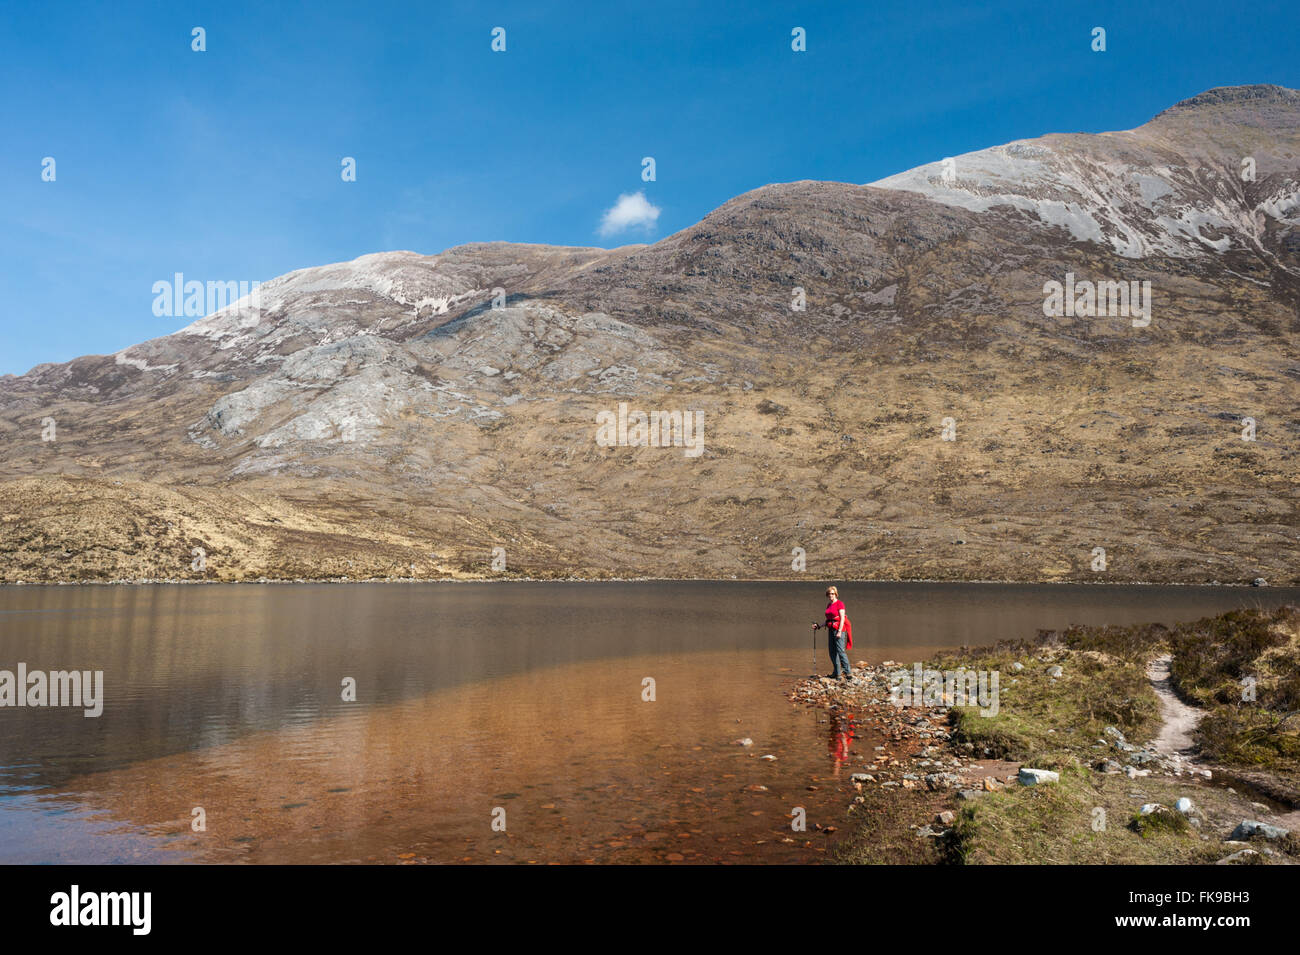 Loch Coire Fionnaraich and the slope of Sgorr Ruadh - Stock Image